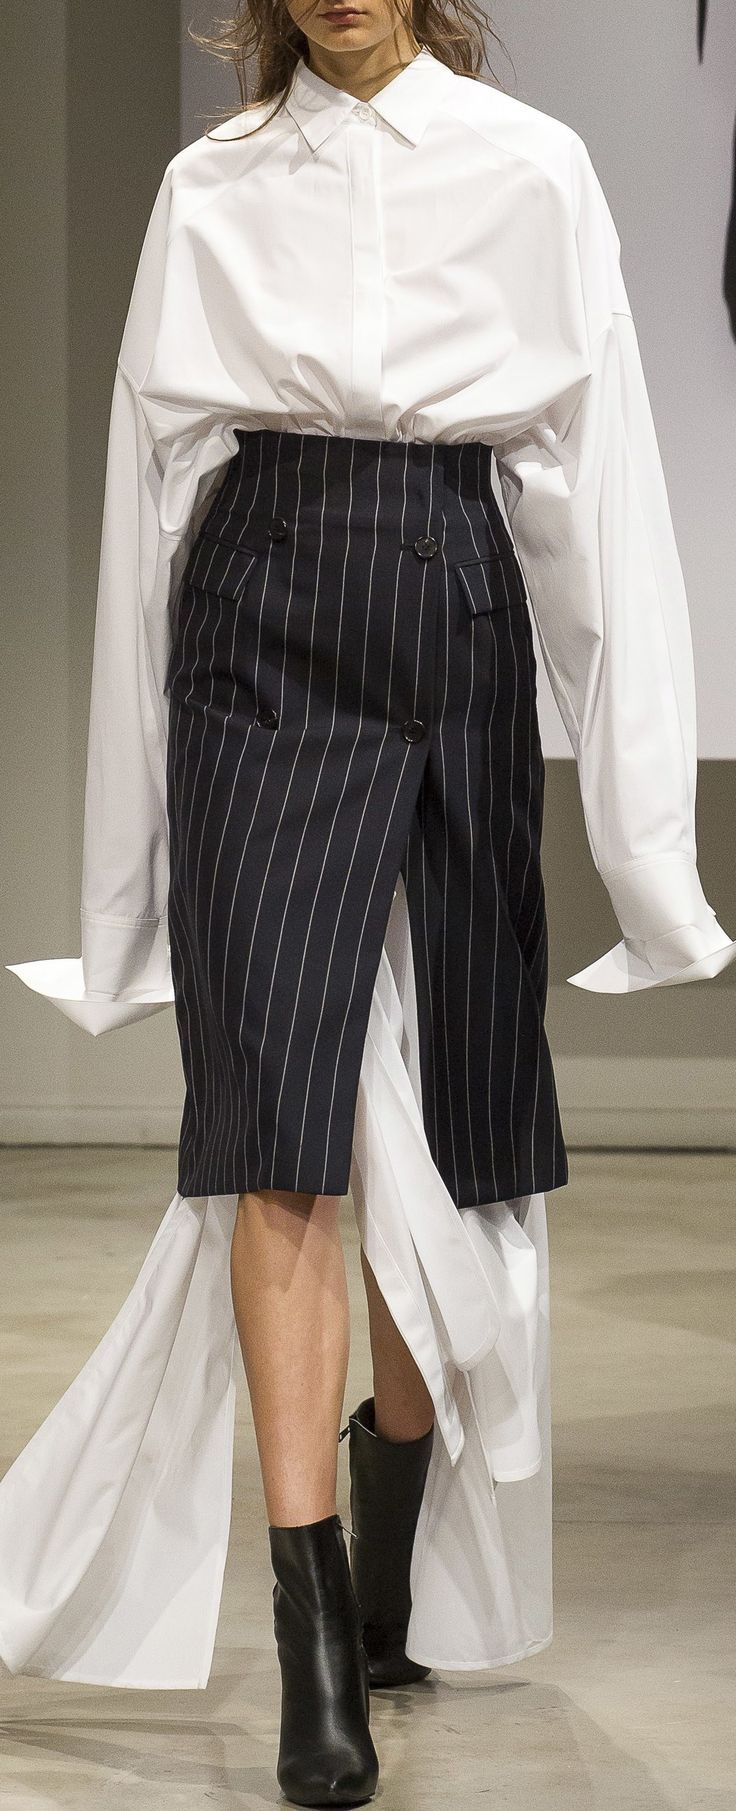 Juun.J Spring 2018 Menswear collection.